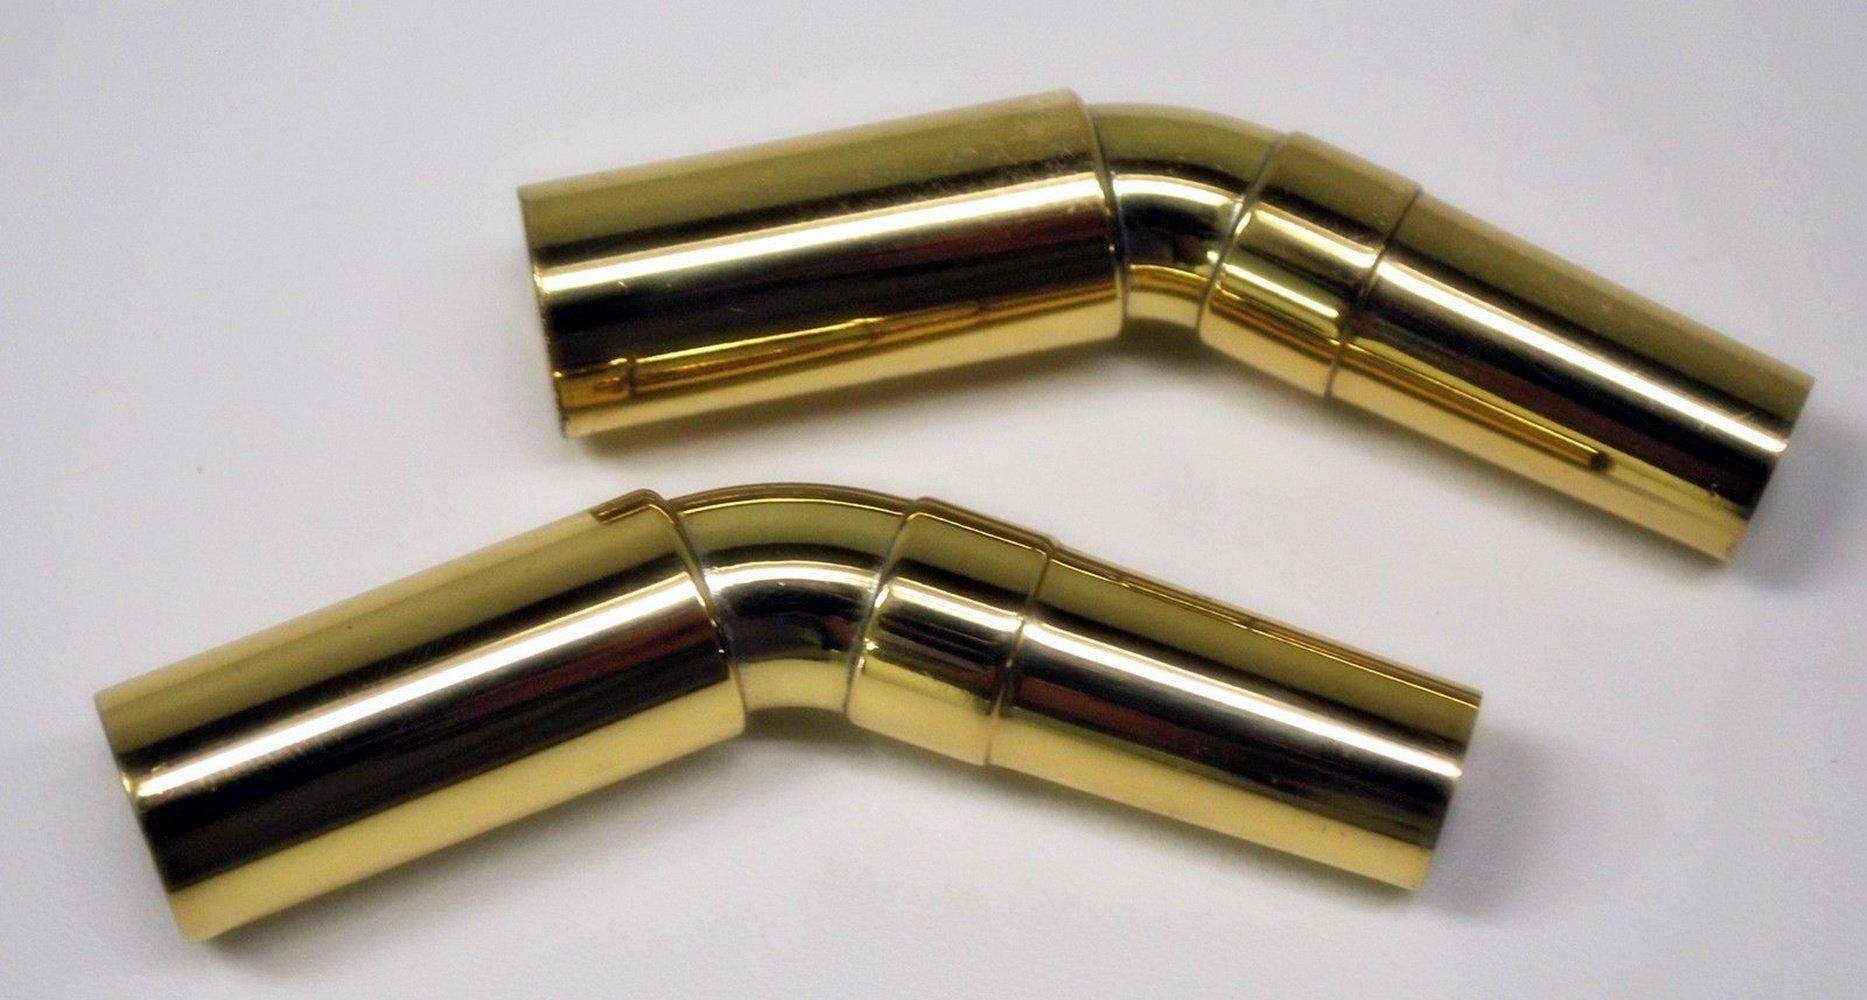 Sousaphone bits olds lacquer finish